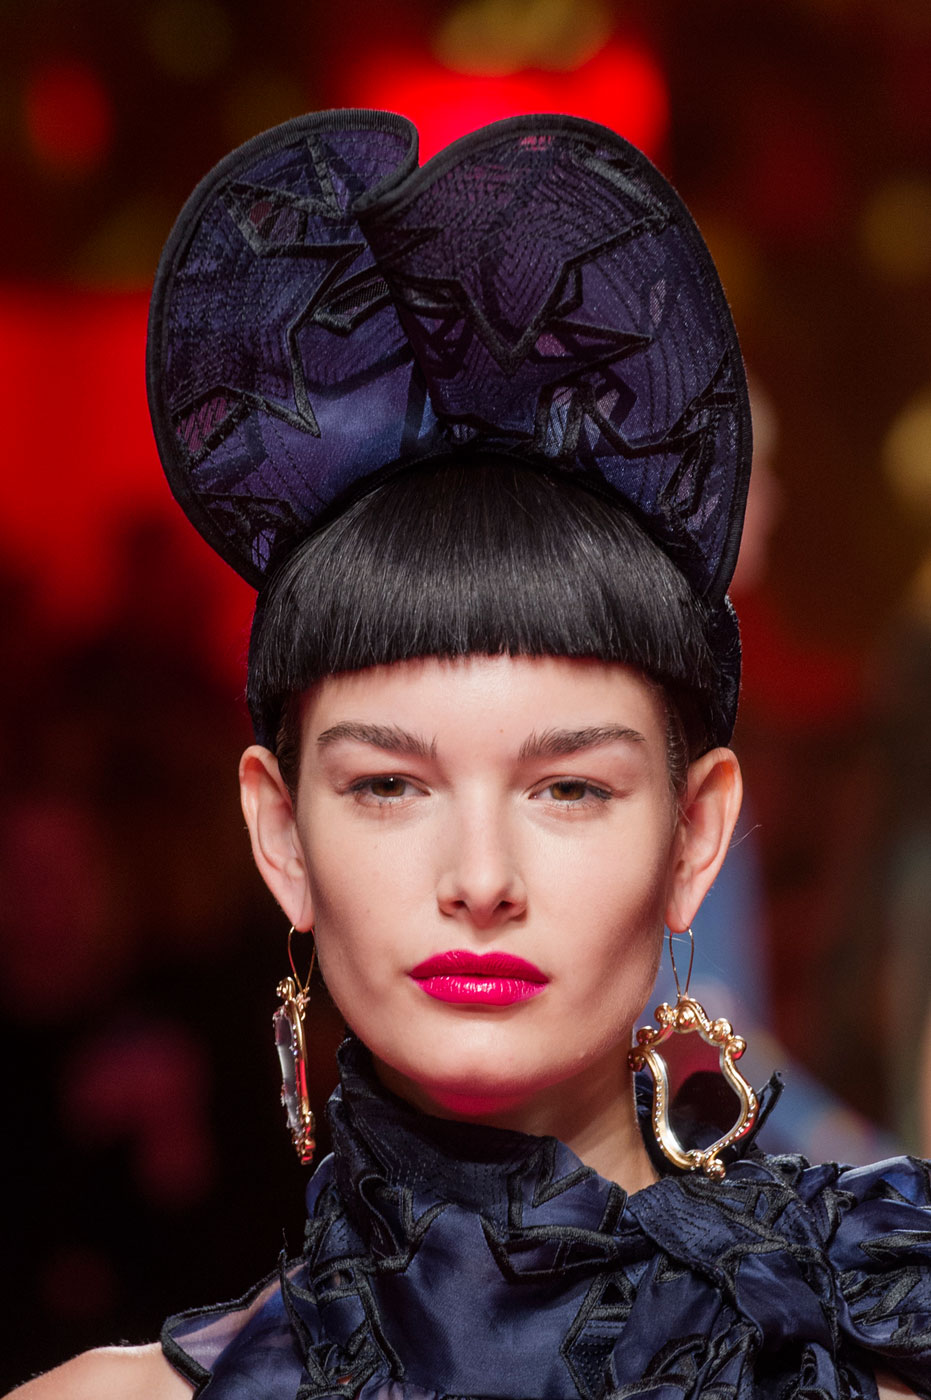 Schiaparelli-fashion-runway-show-close-ups-haute-couture-paris-spring-summer-2015-the-impression-46